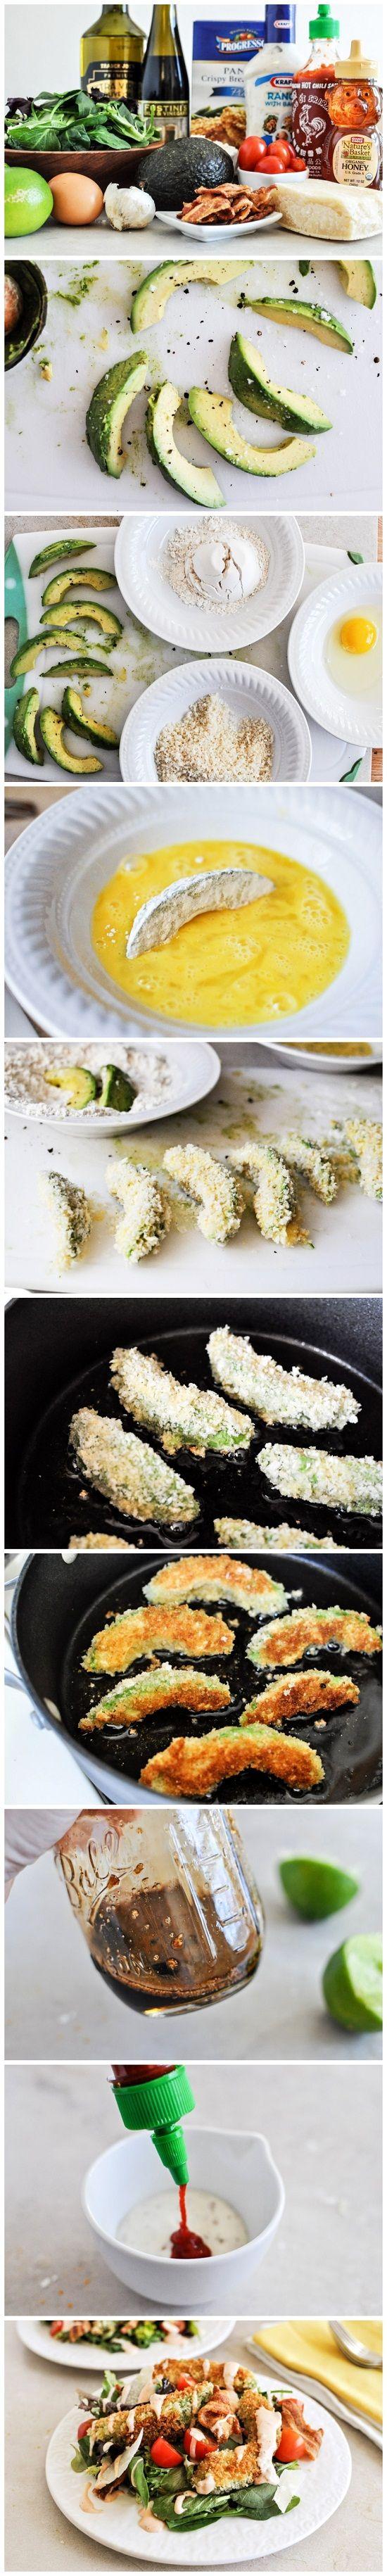 Crispy Avocado, Bacon and Tomato Salad